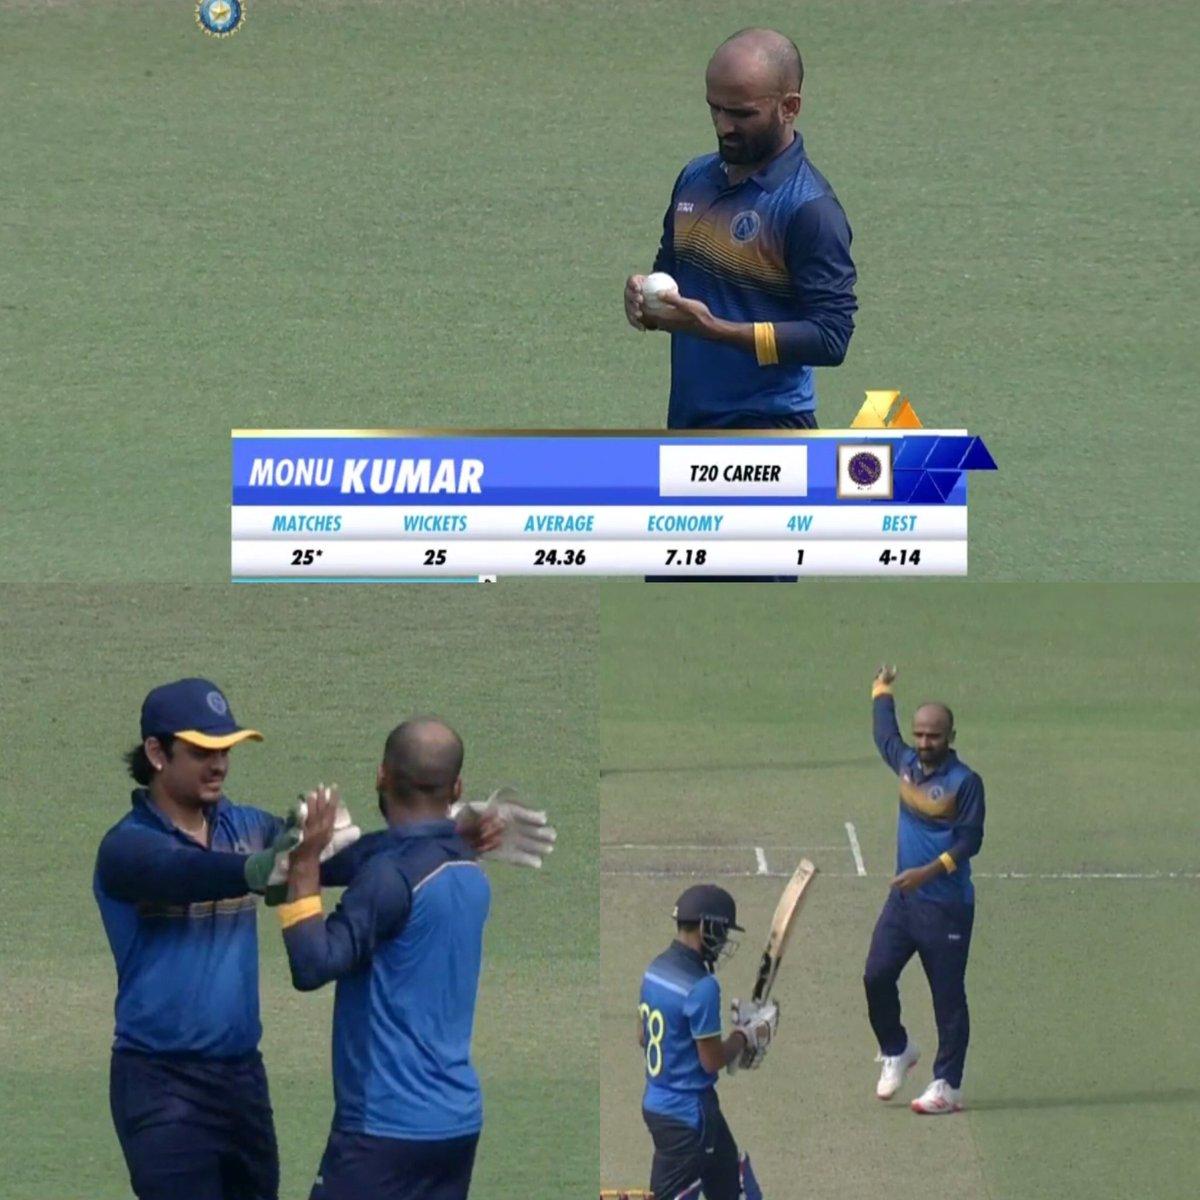 Top spell from Monu singh against Bengal in Syed Mushtaq Ali Trophy  4️⃣overs 3️⃣0️⃣ runs 3️⃣ wickets  #JHAvBEN #SyedMushtaqAliT20